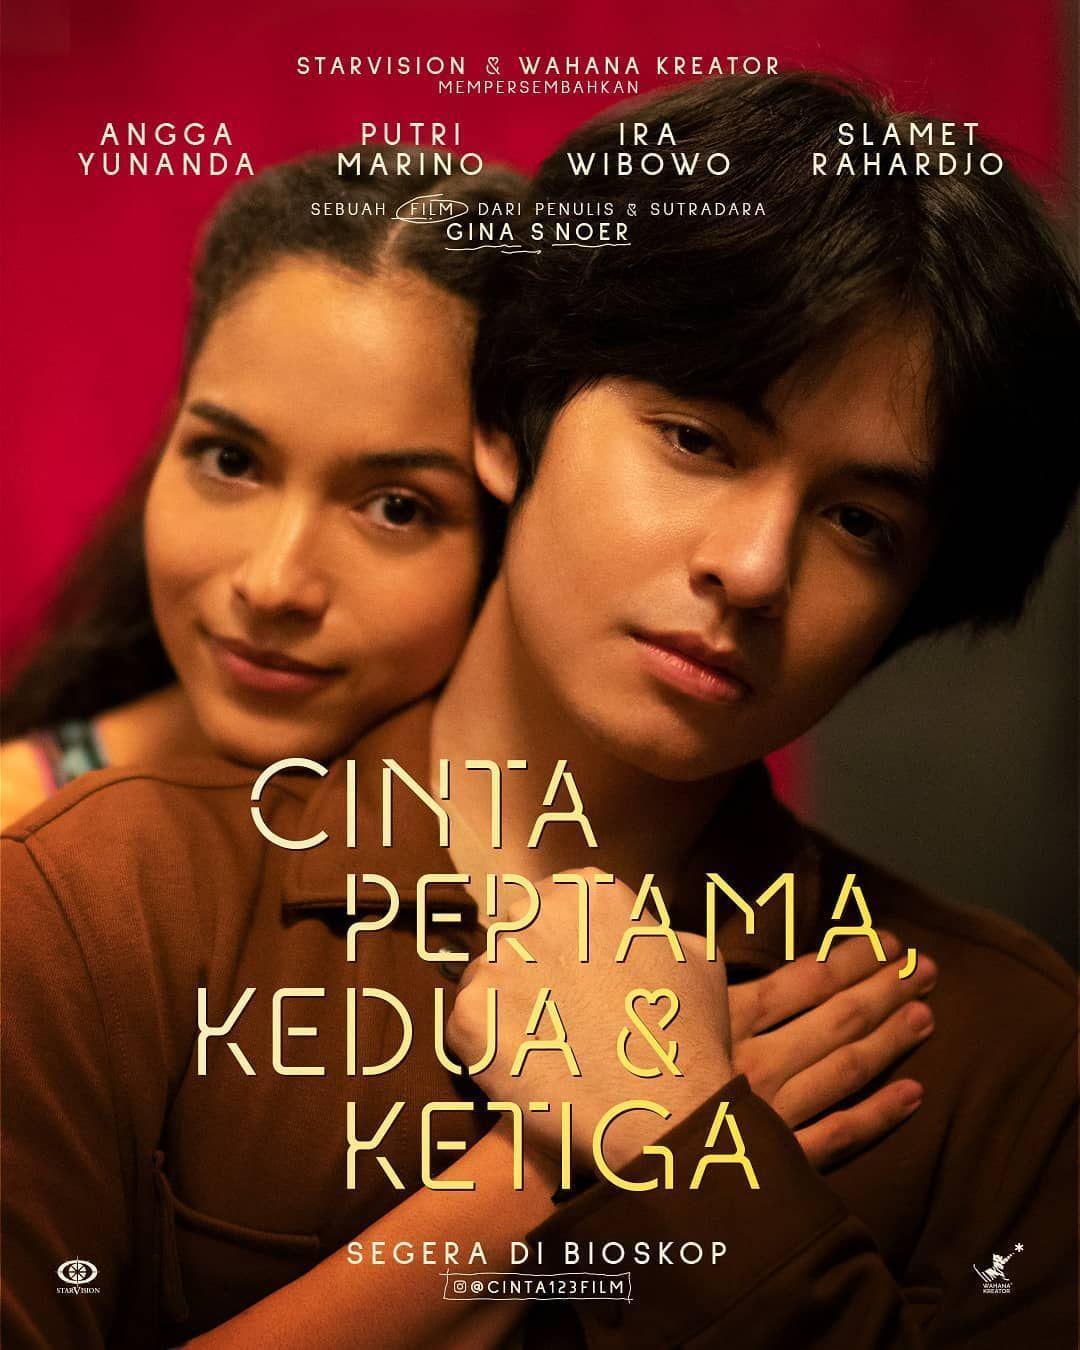 Film Cinta Pertama, Kedua dan Ketiga